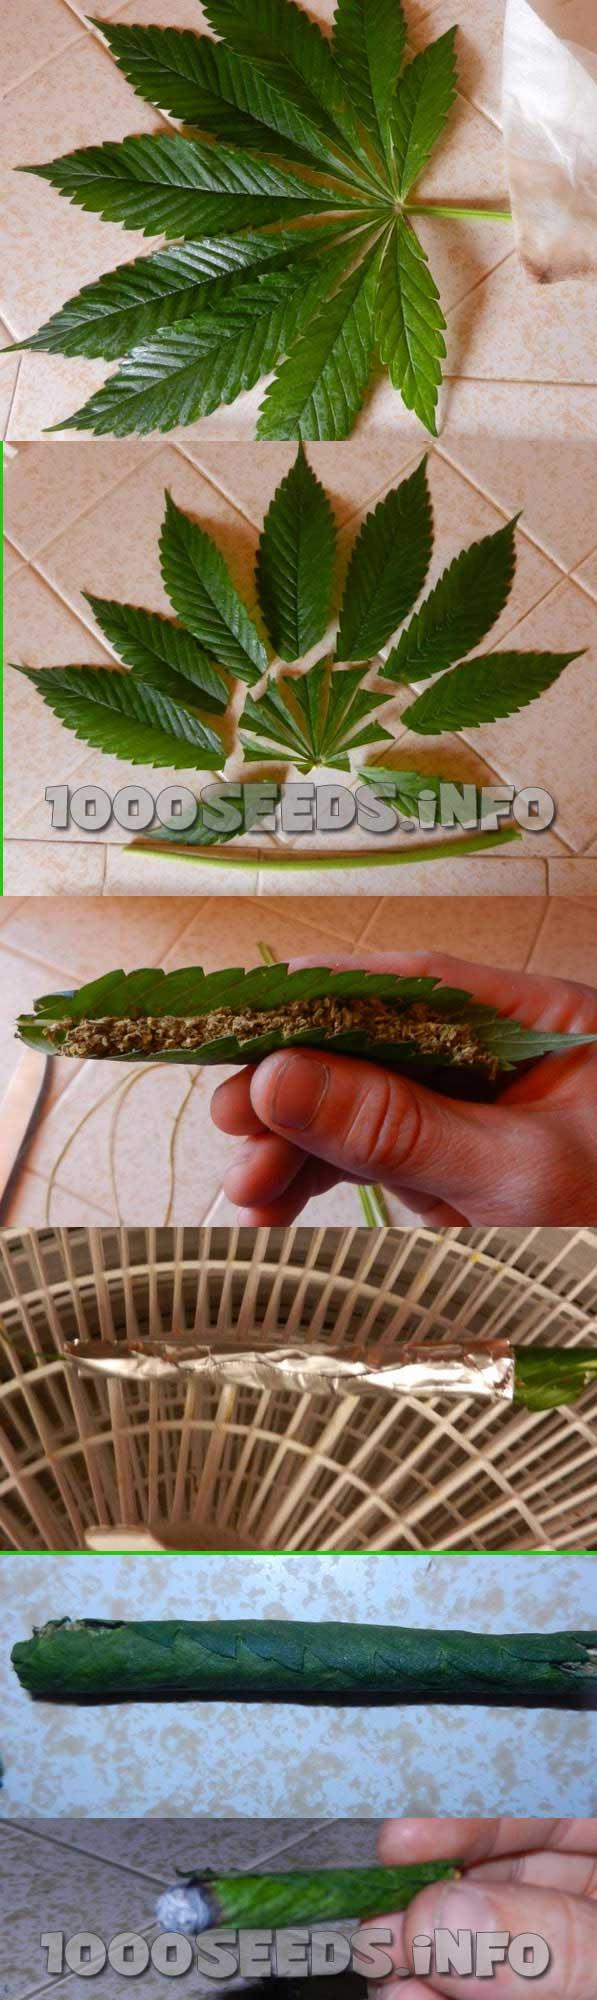 Cannabisblatt-zum-Rollen, mit Cannabisblatt joint rollen